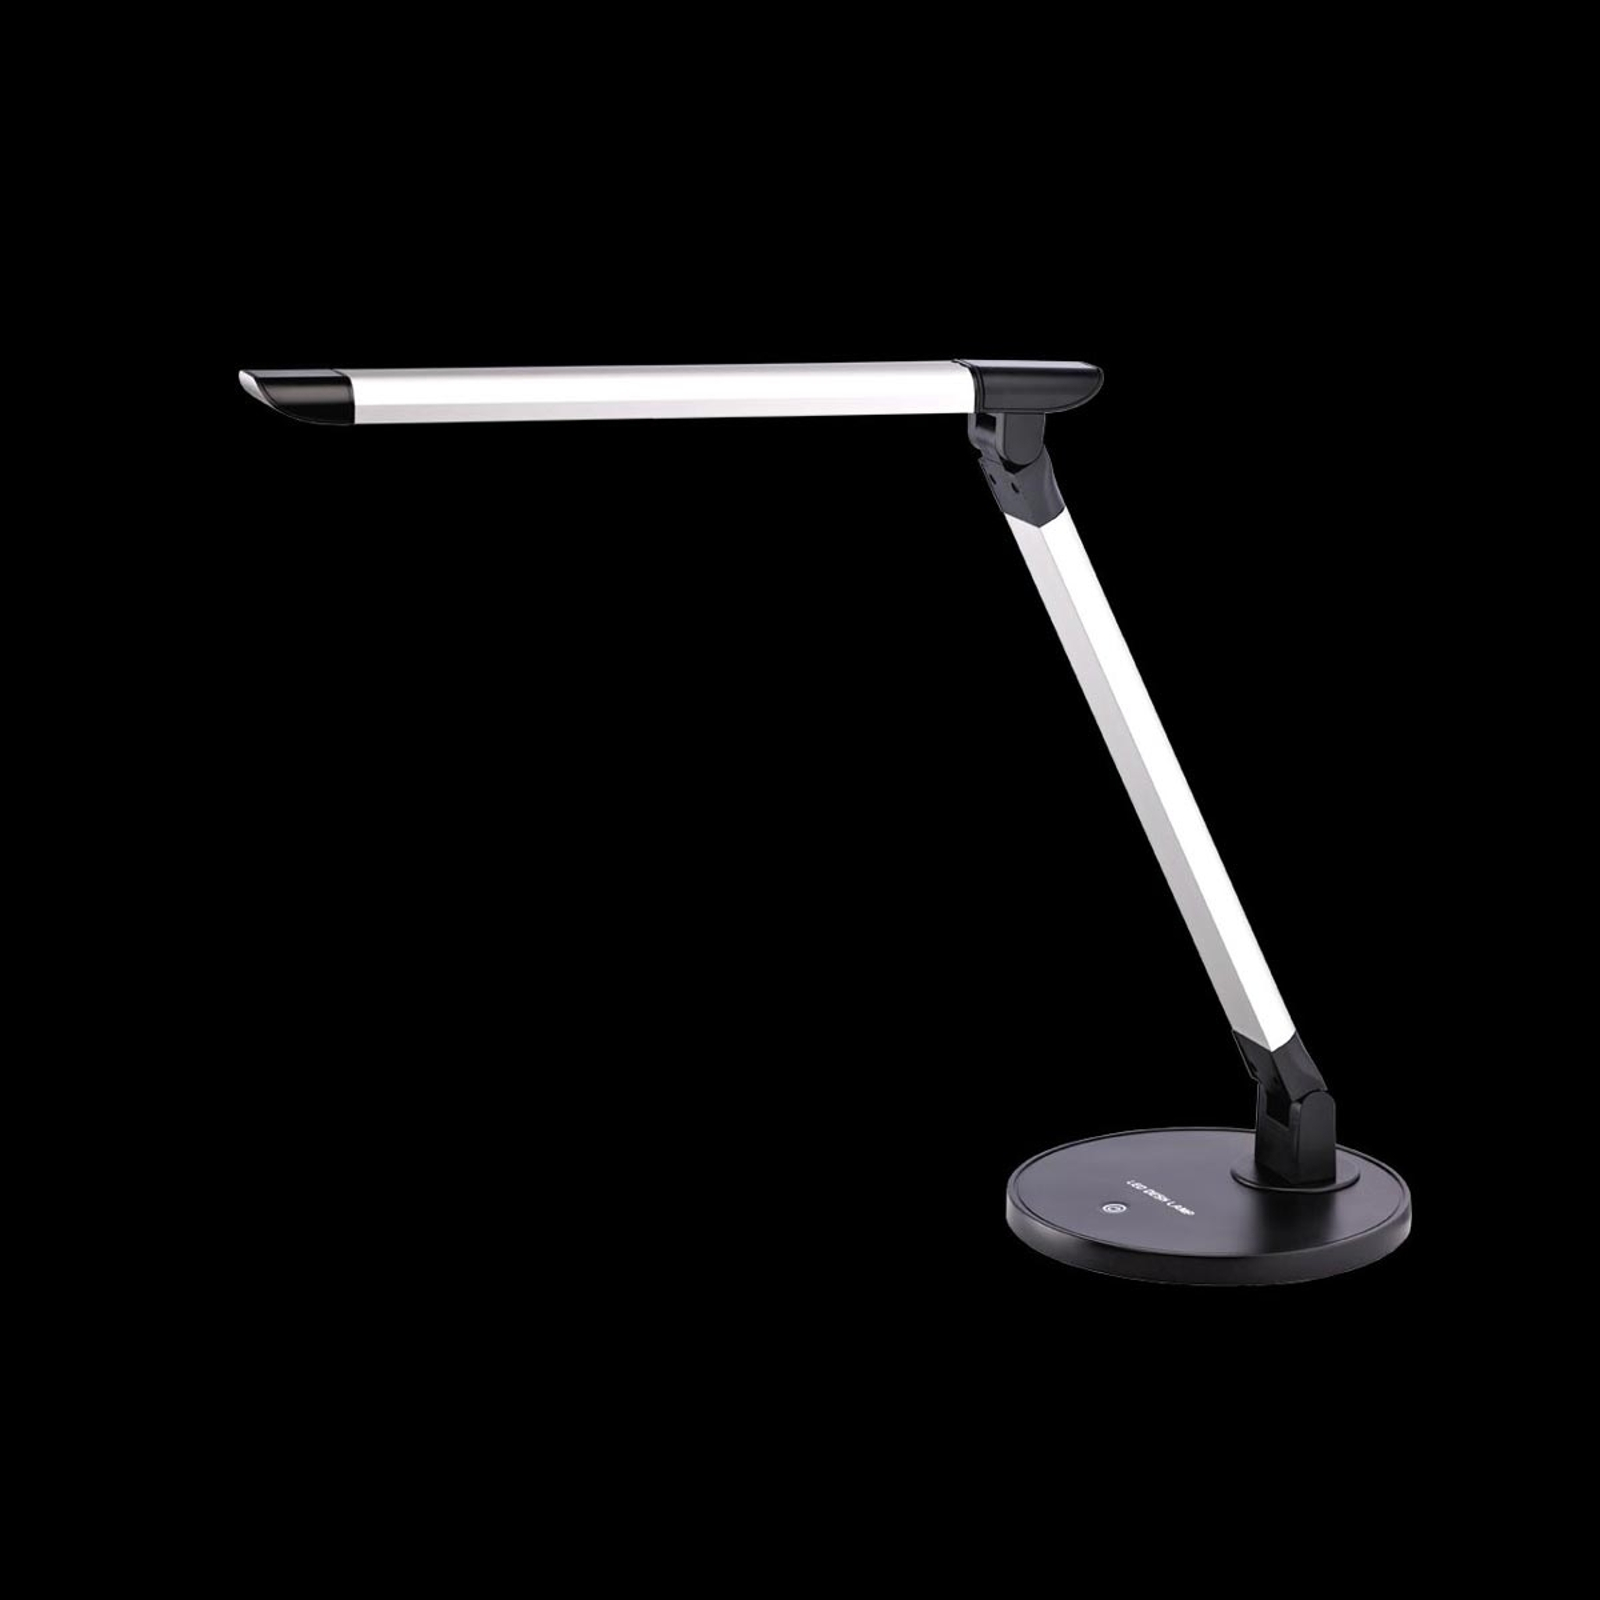 Faltbare LED-Tischleuchte Chris m. Dimmer